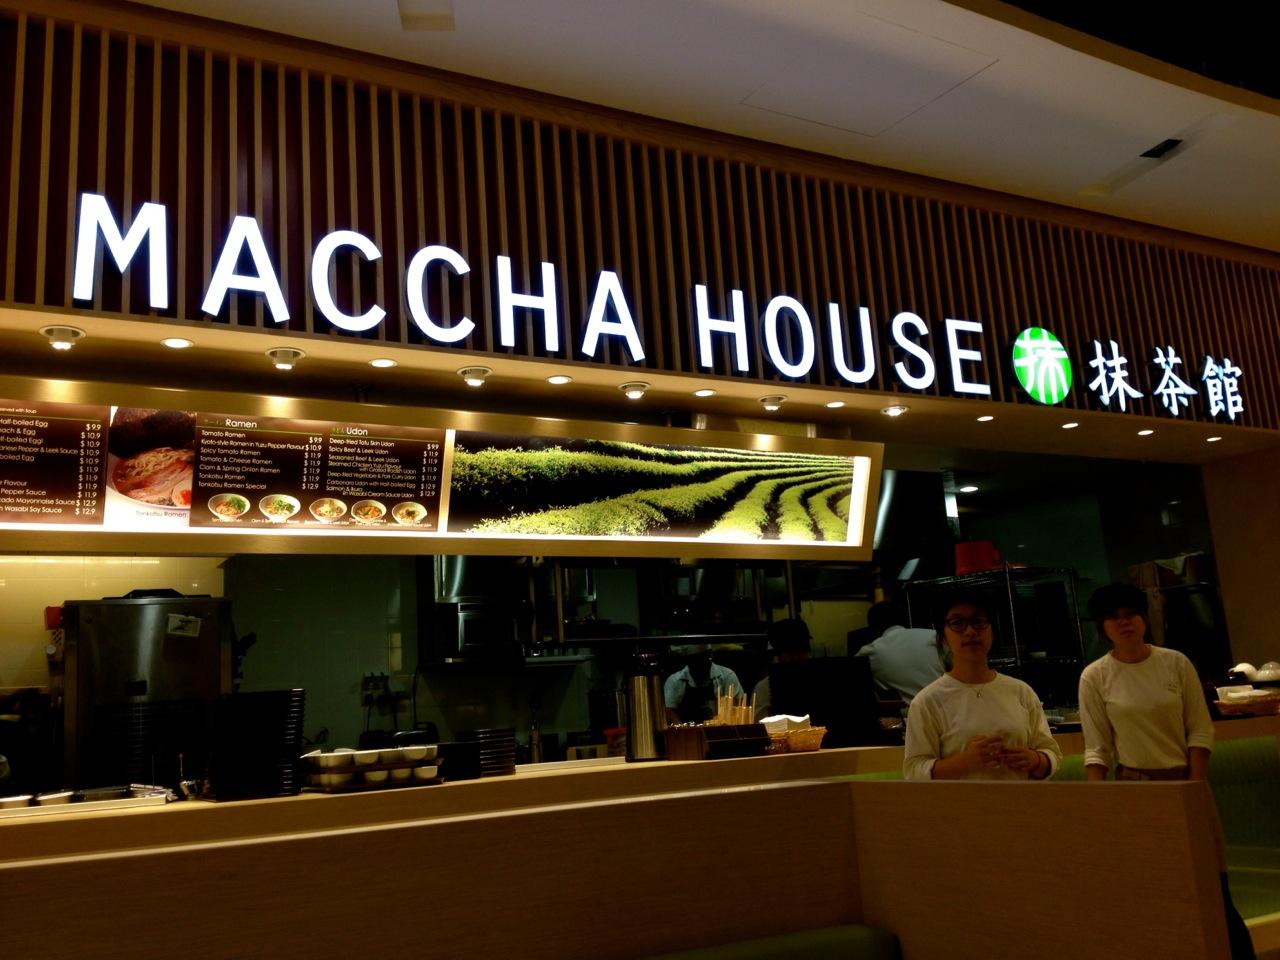 the matcha house